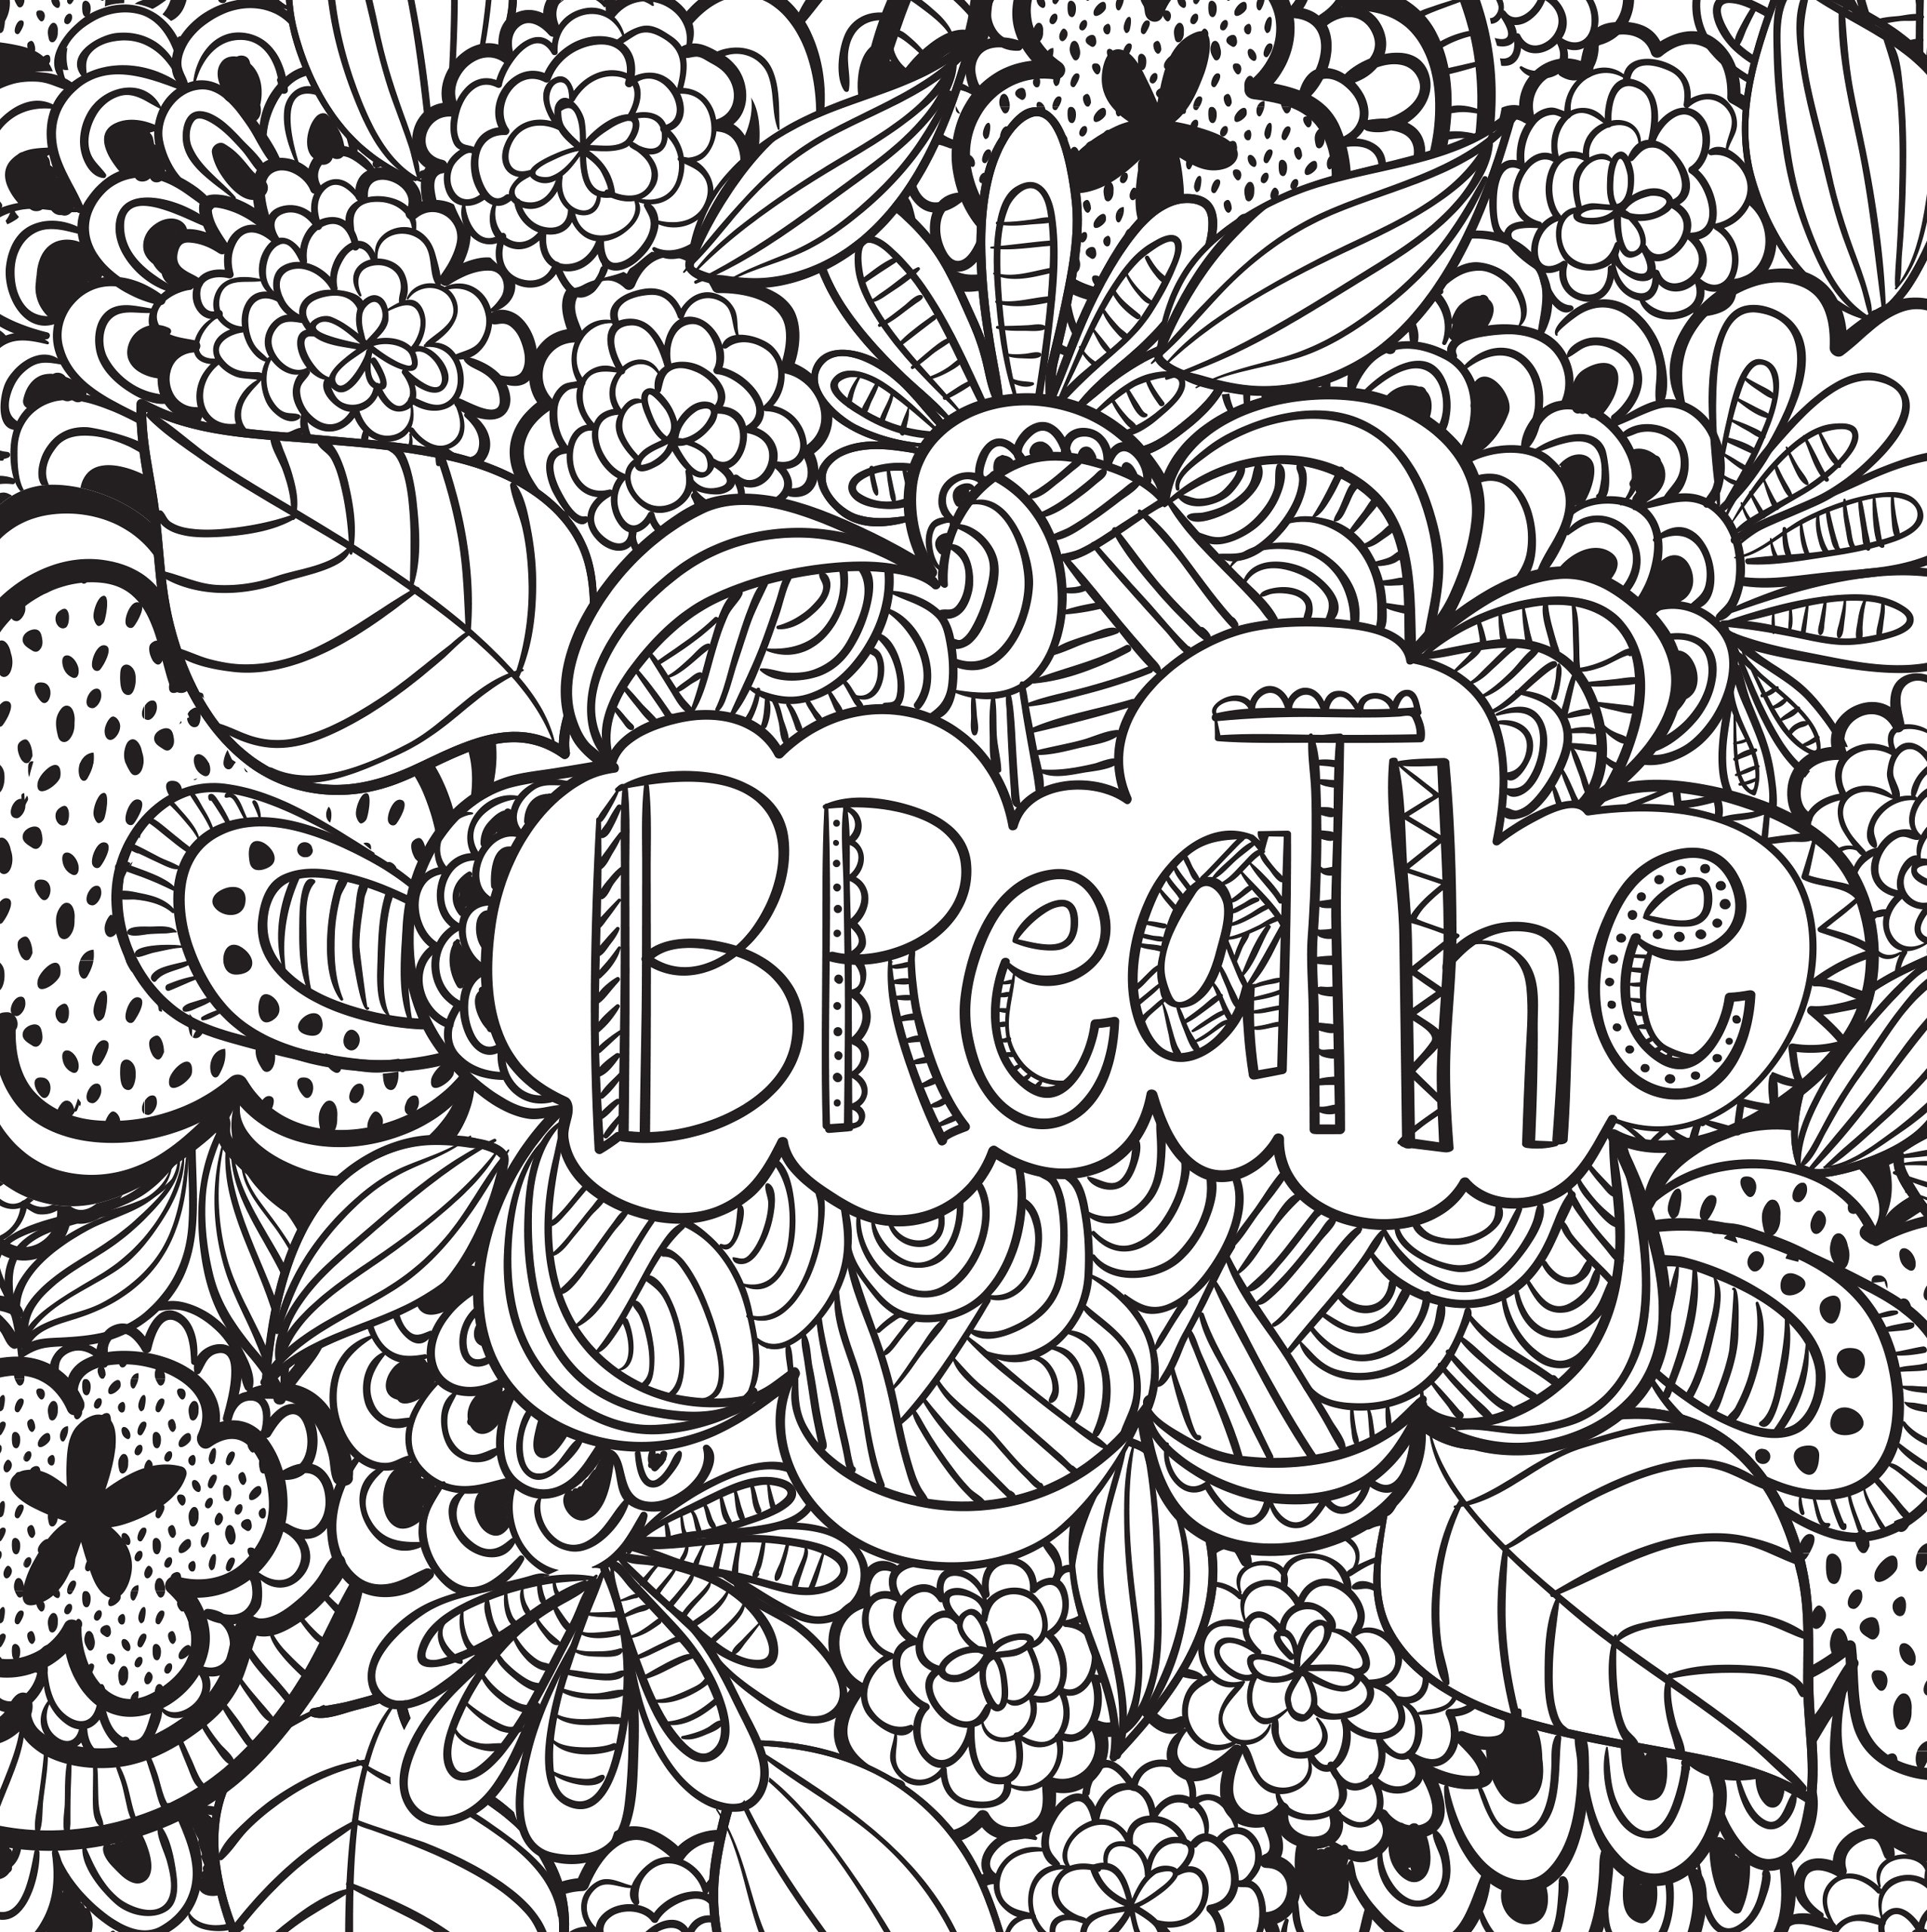 Joyful Inspiration Adult Coloring Book 31 Stress Relieving Designs Peter Pauper Press 9781441318794 Books